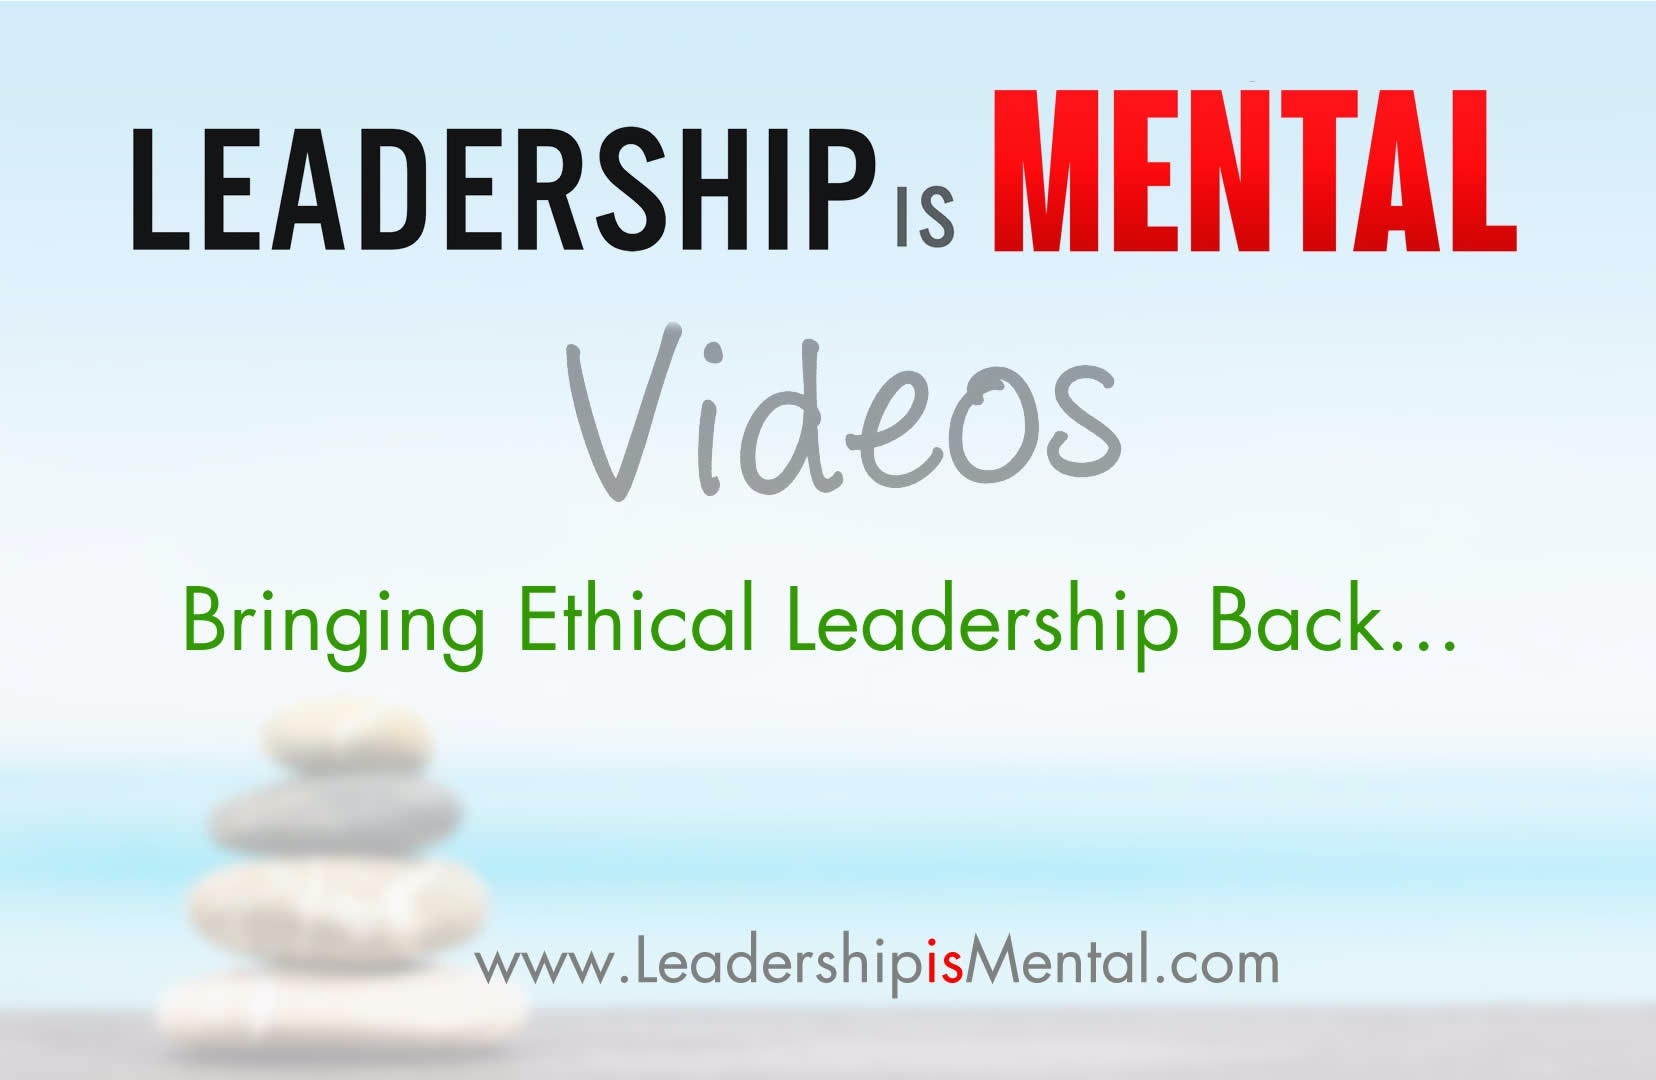 Bringing Ethical Leadership Back